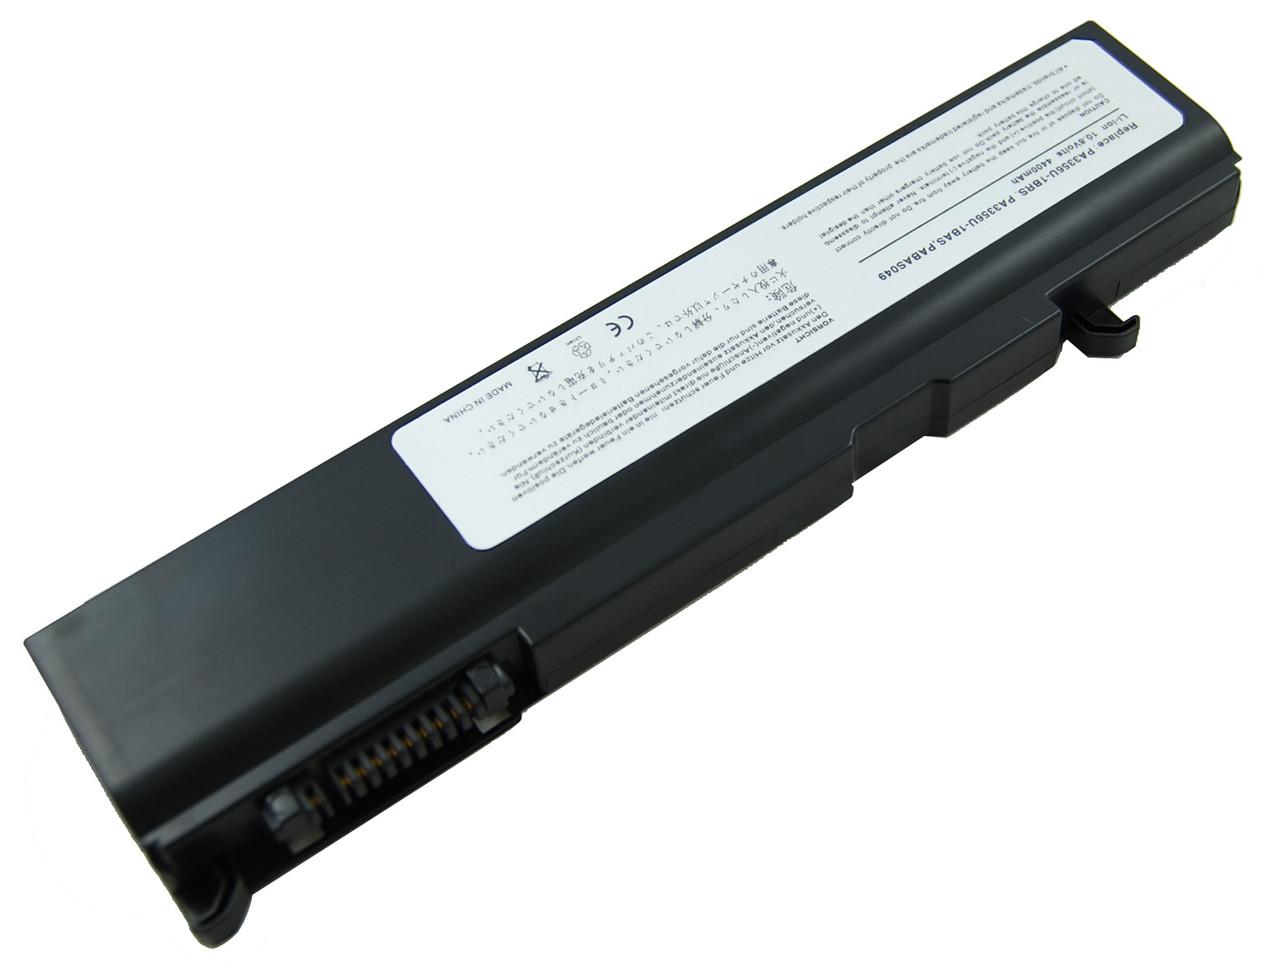 Аккумулятор для ноутбука Toshiba PA3456U-1BRS